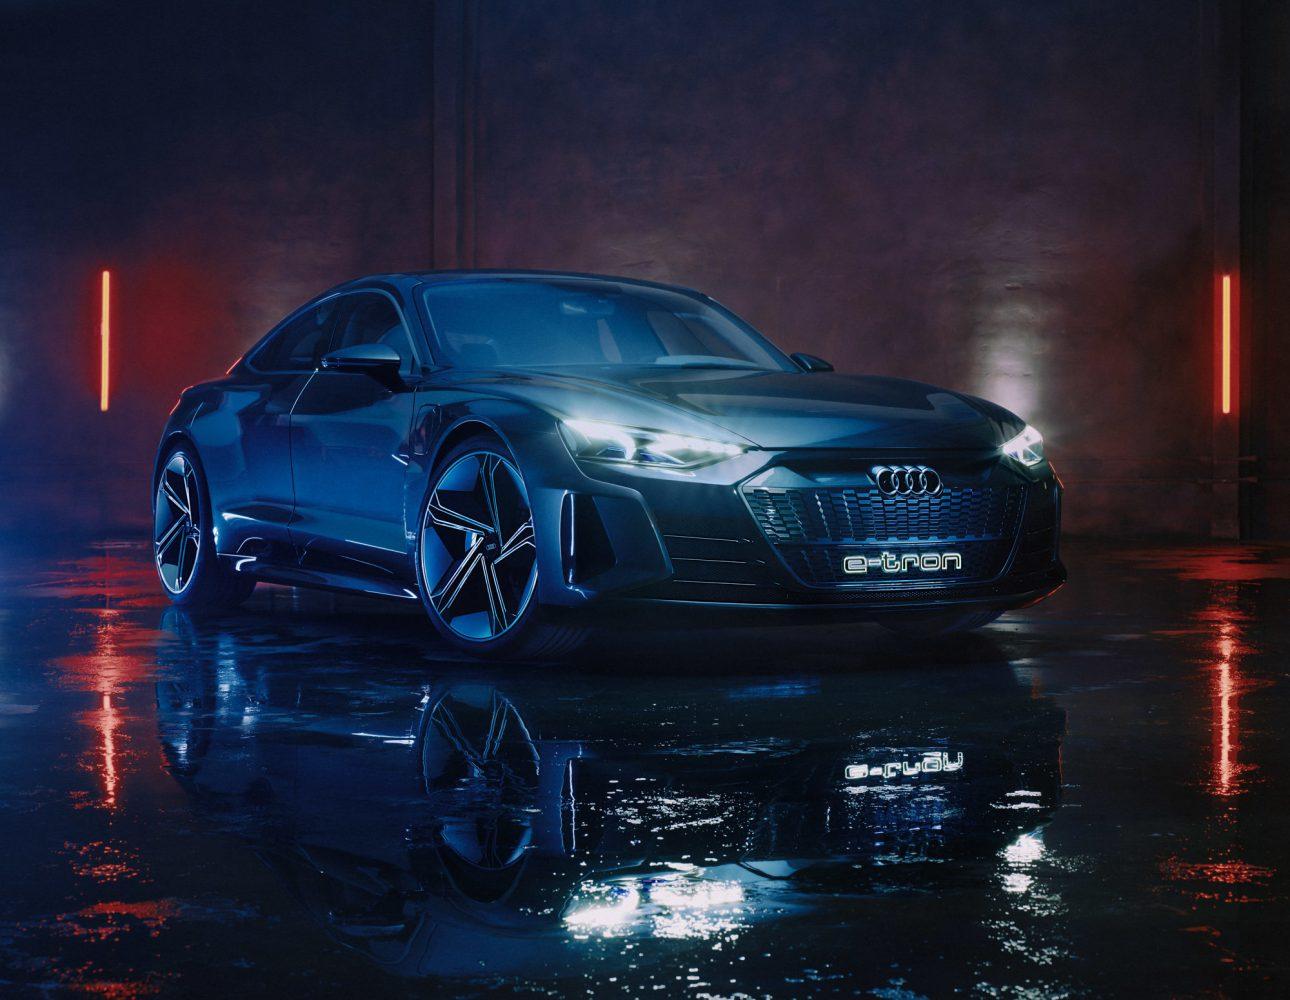 02 Audi 34 1080 2